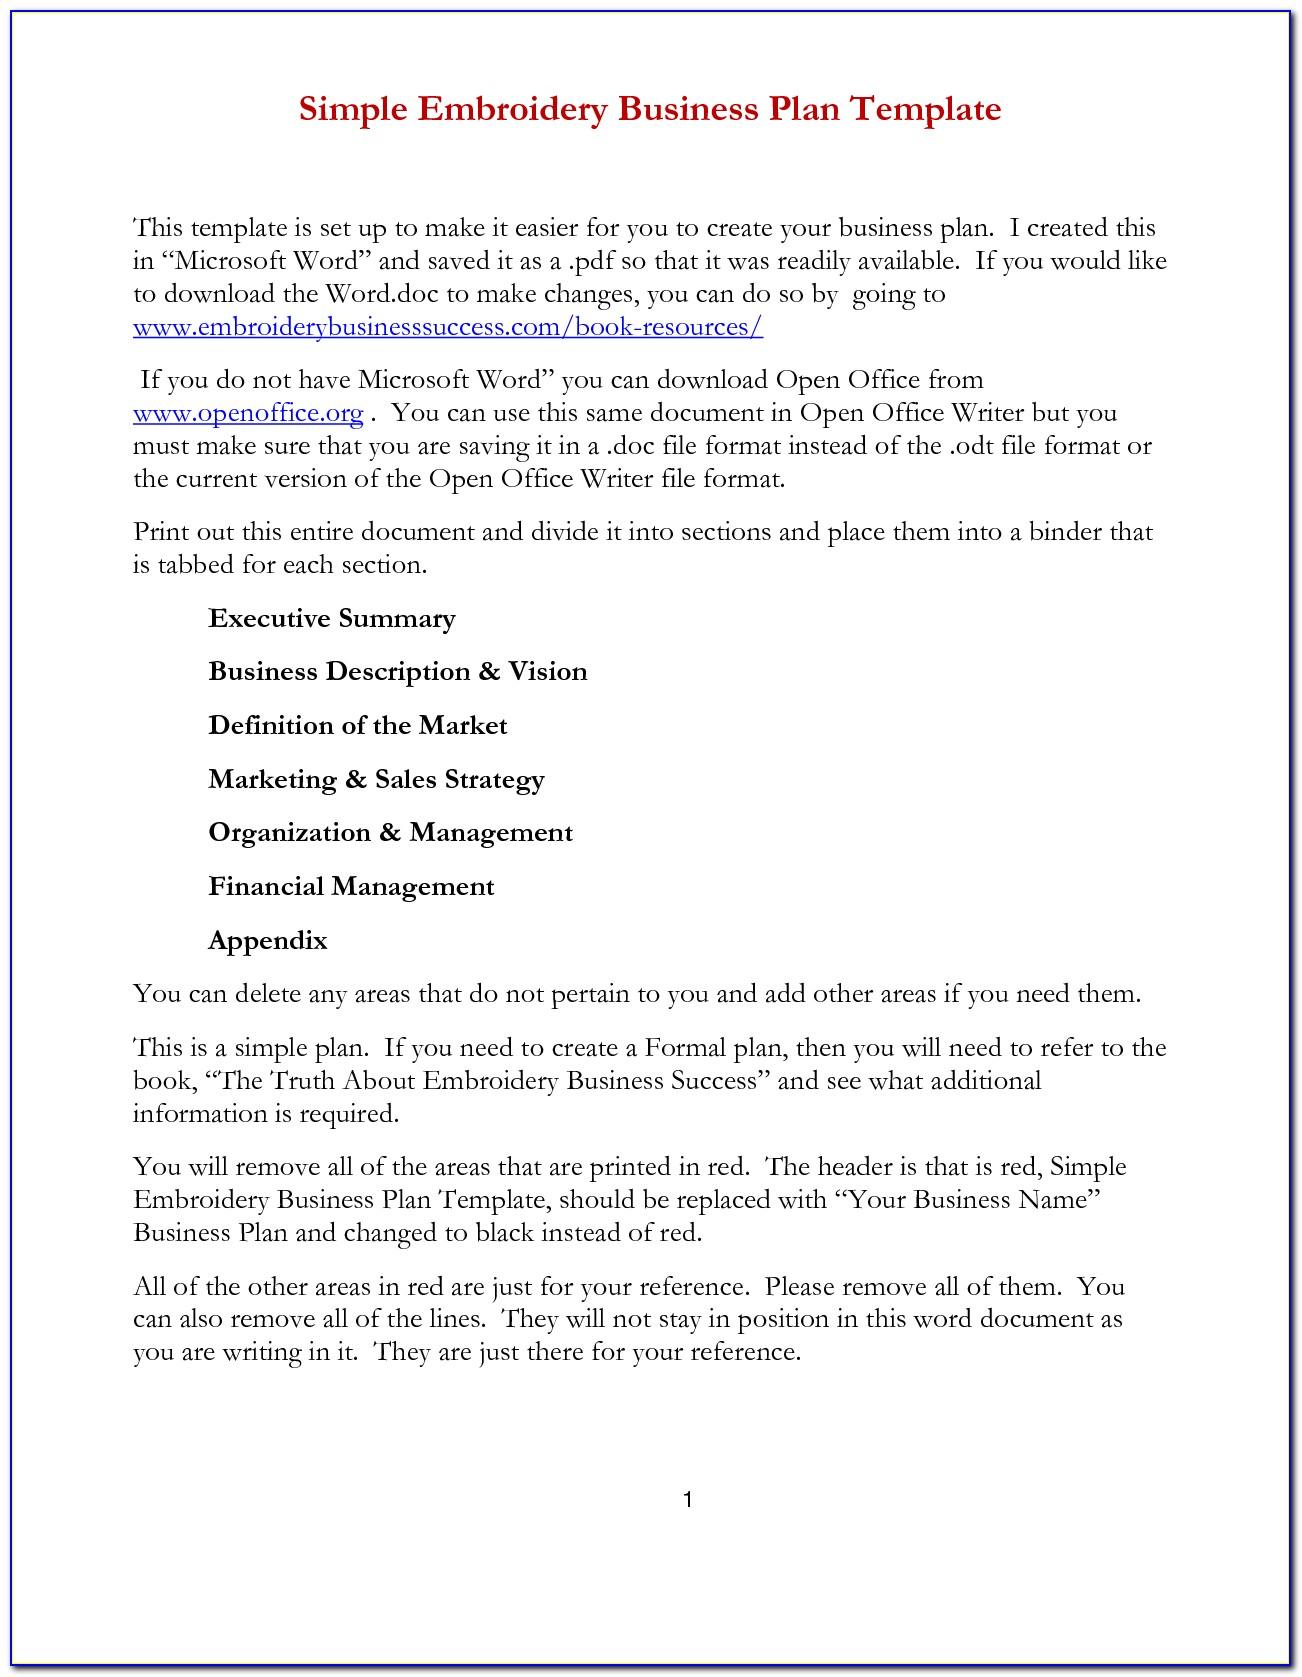 Simple Business Plan Template Microsoft Word